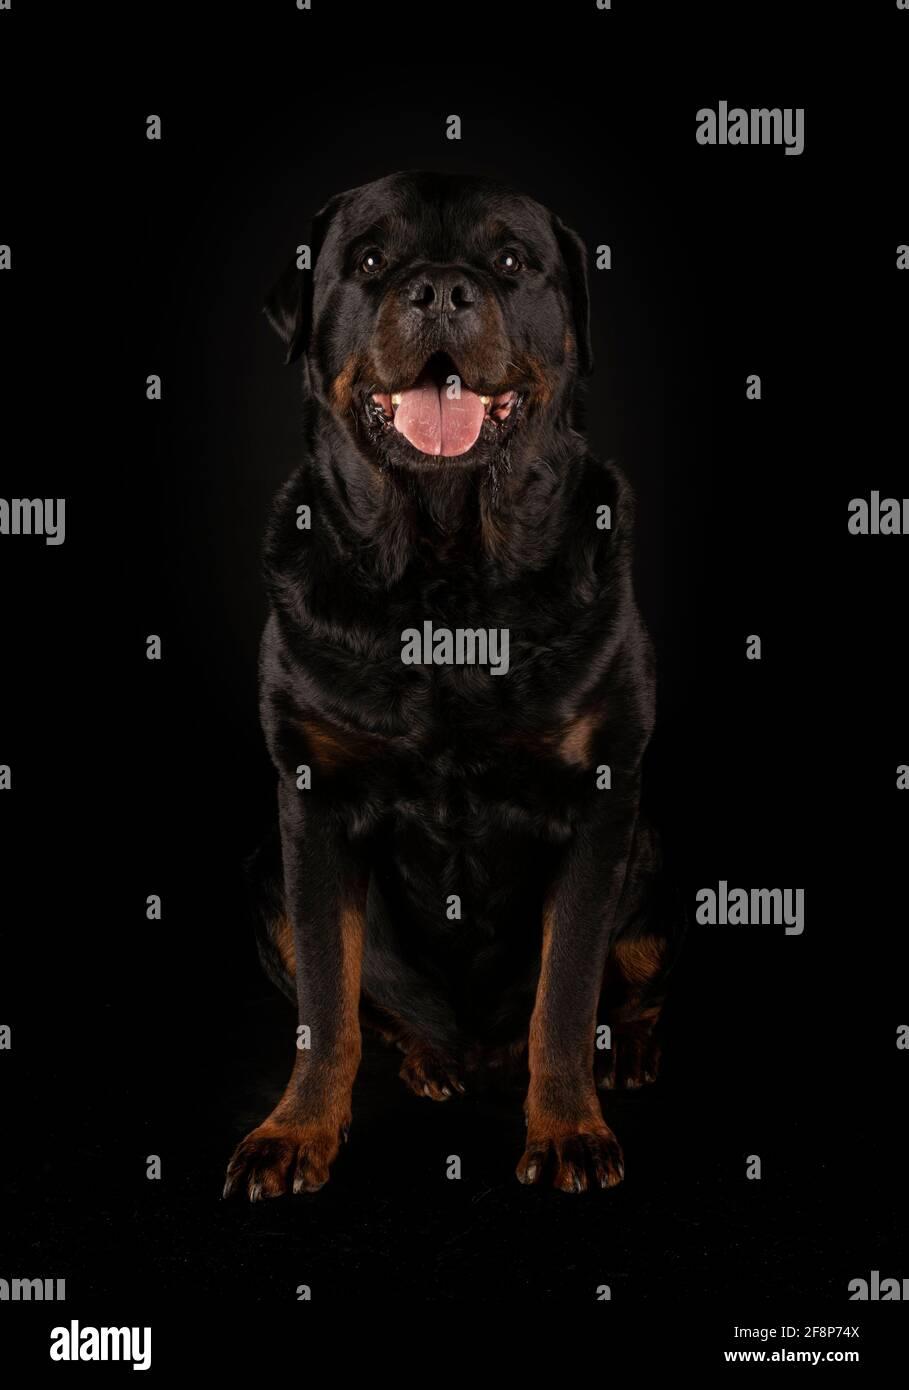 Raza rottweiler delante de fondo negro Foto de stock